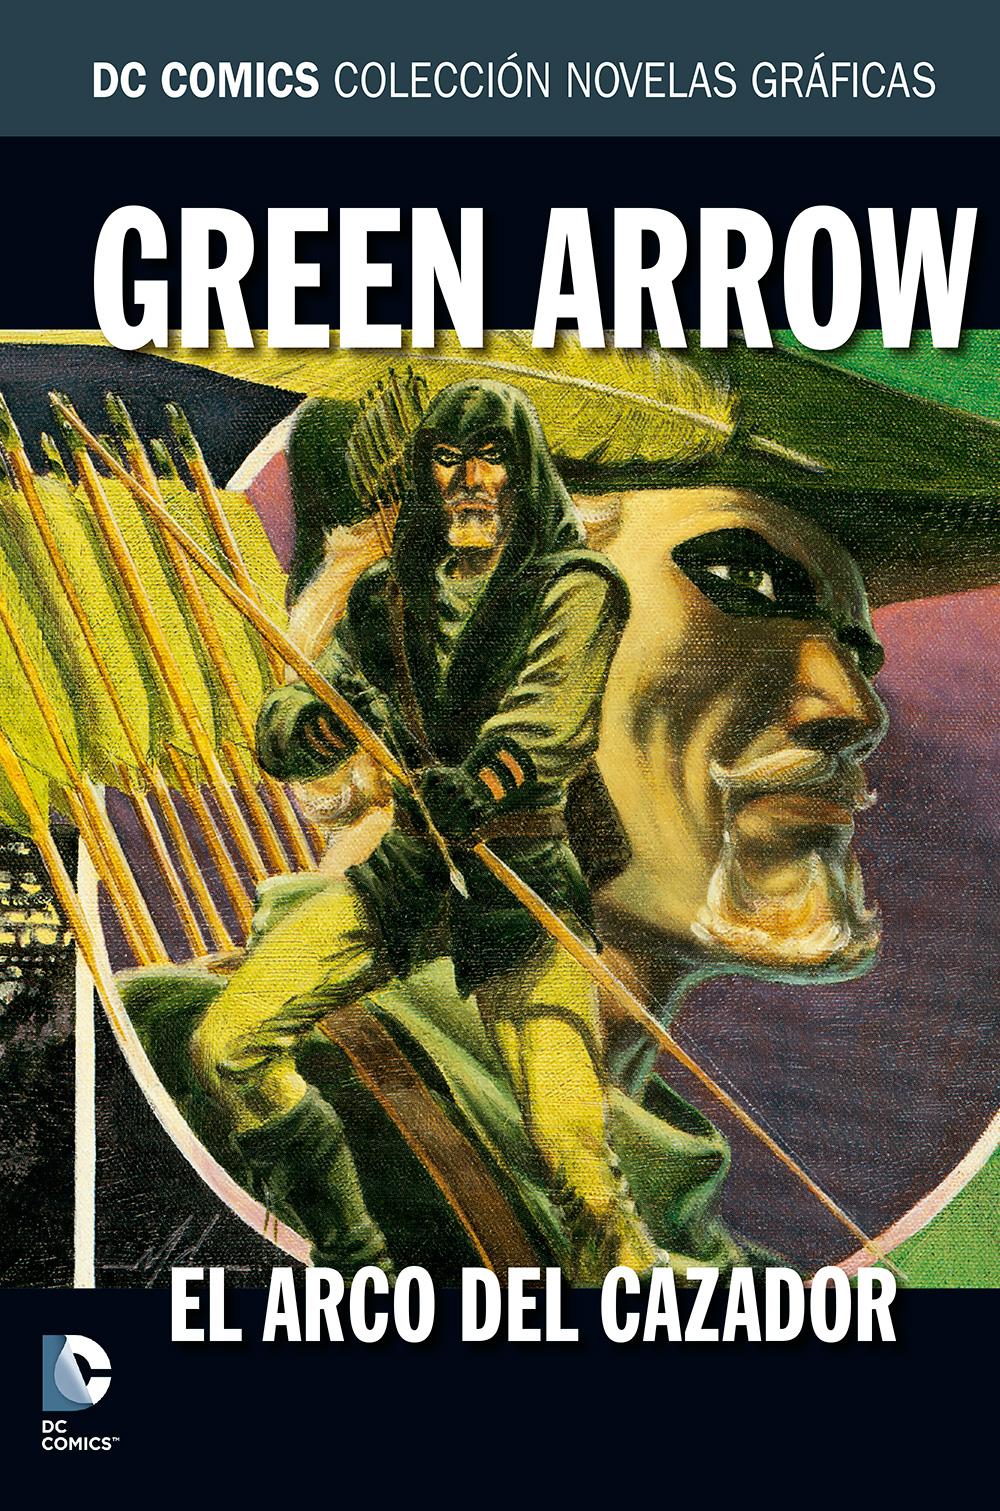 201 - [DC - Salvat] La Colección de Novelas Gráficas de DC Comics  SF118_033_01_001